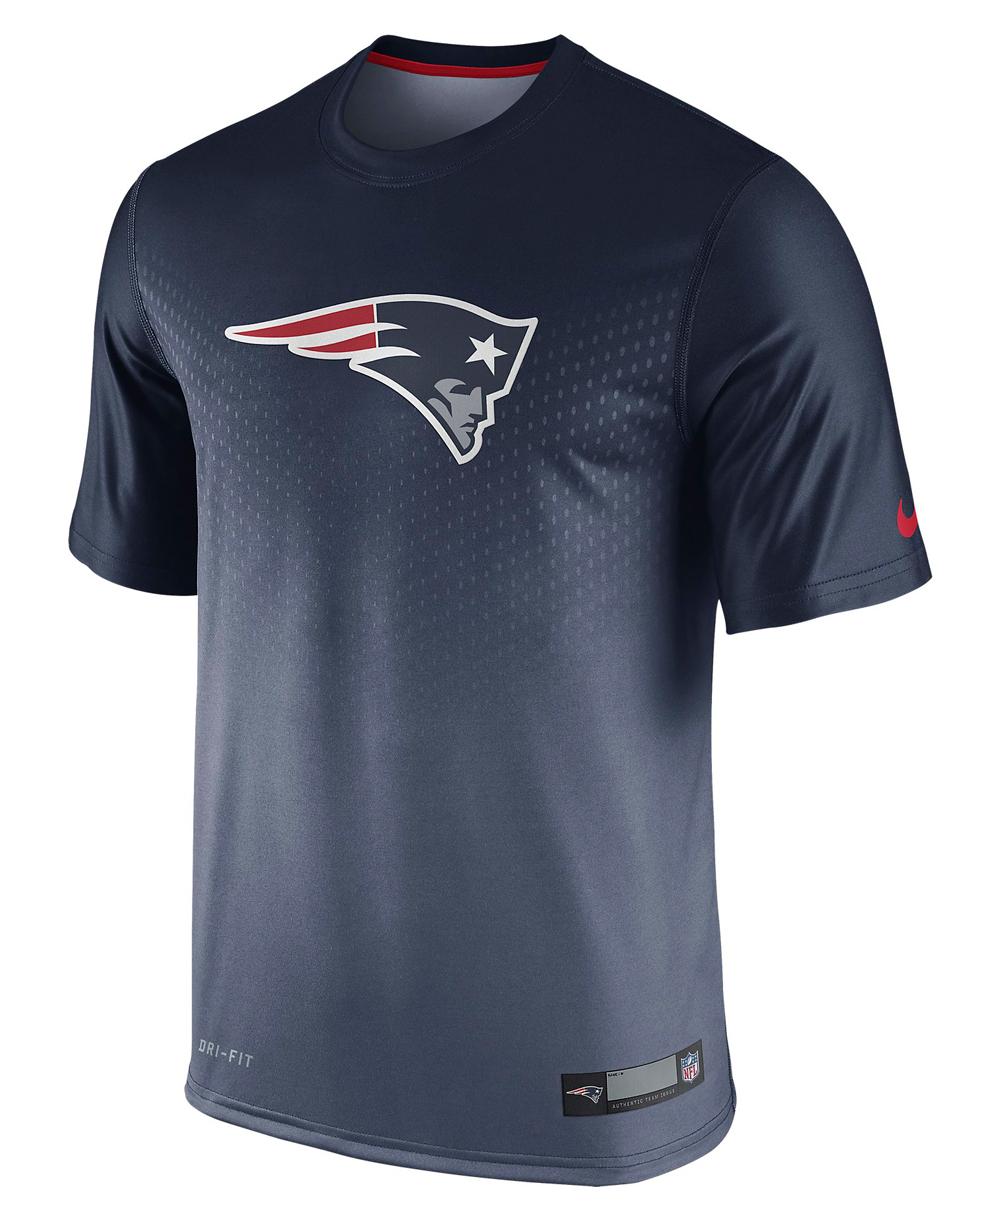 95f302672 Nike Men's Short Sleeve T-Shirt Legend Sideline NFL New England Pat...